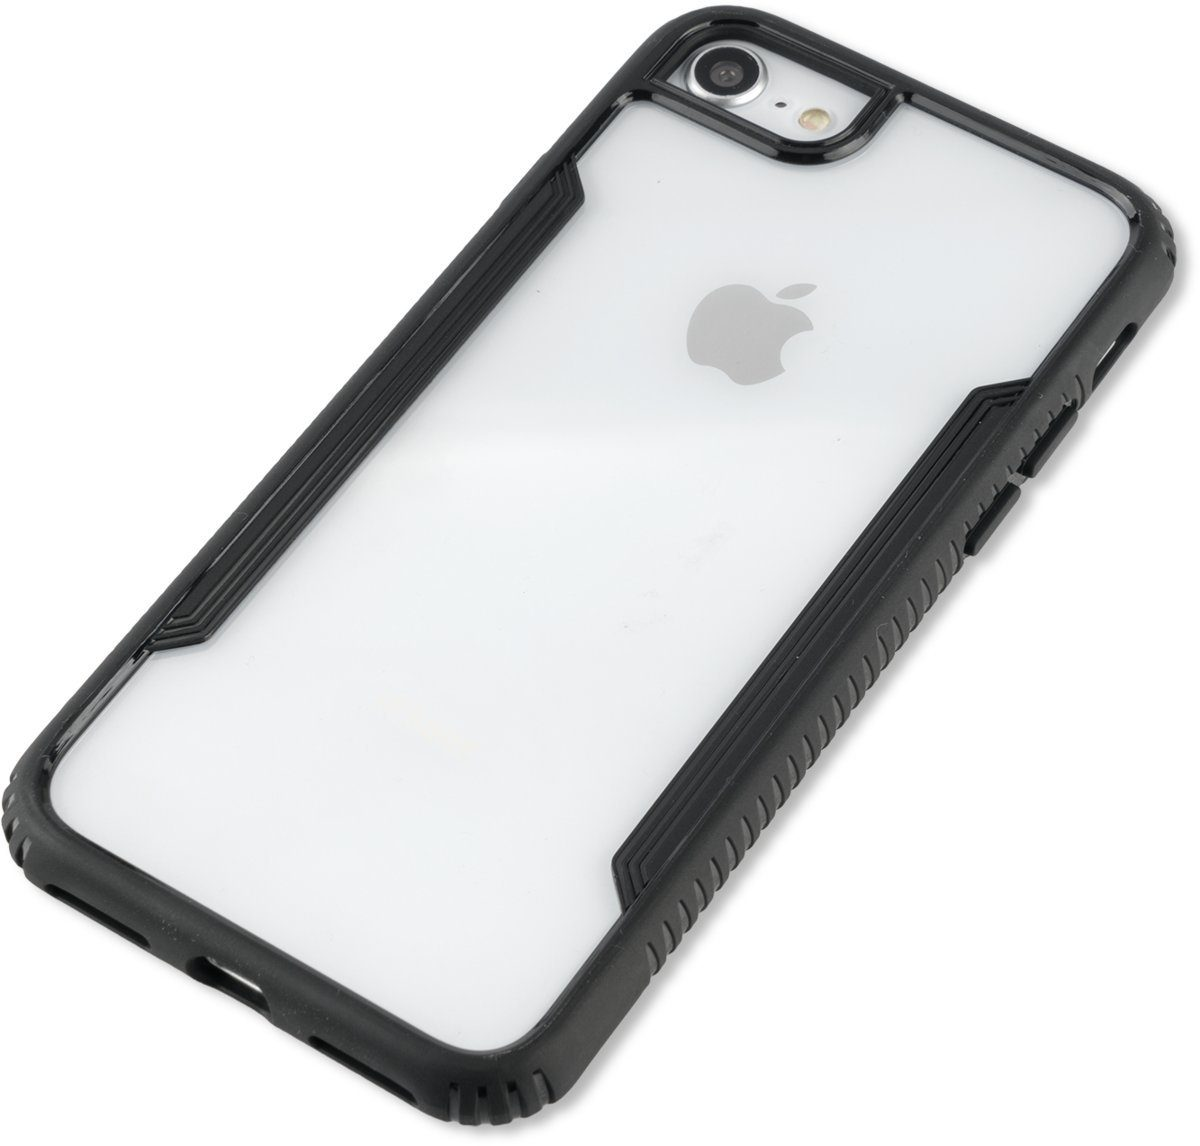 4Smarts Back »Hardcover Clip-On Premium KNOX für iPhone 7 / 8«